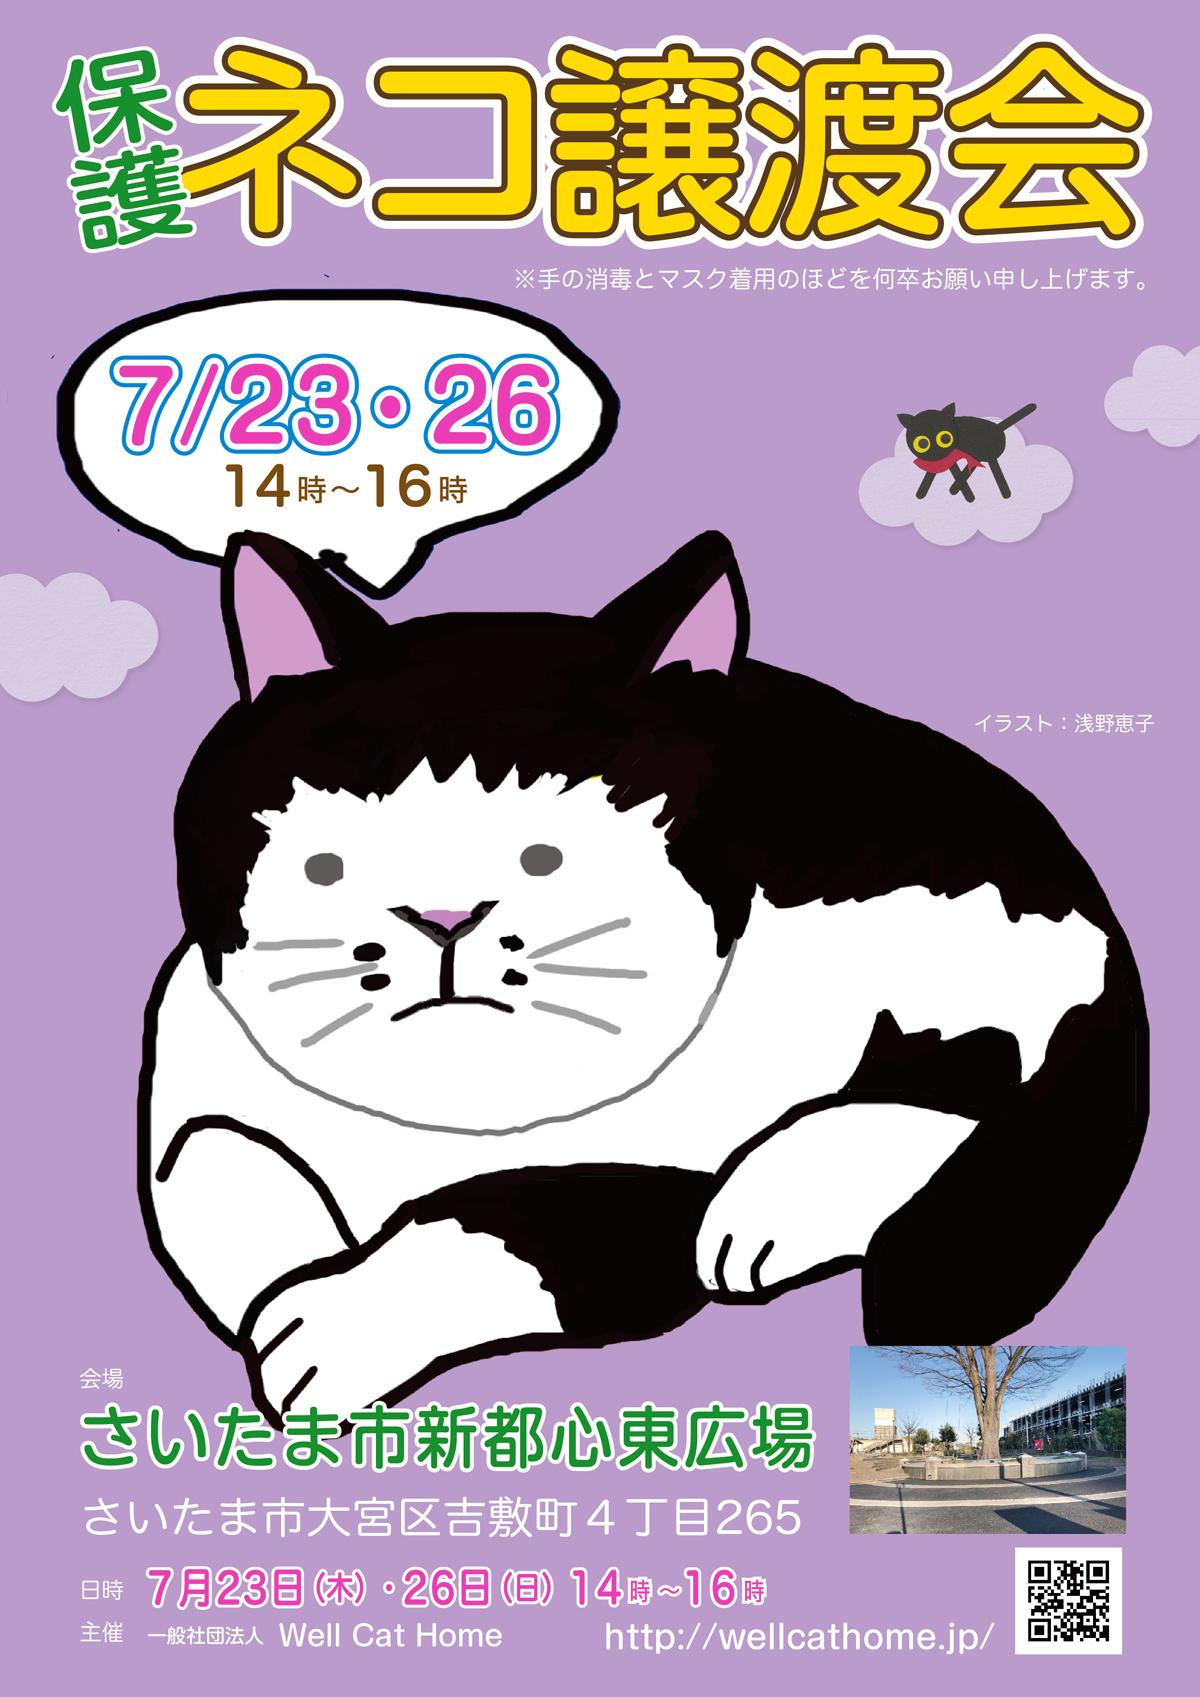 wellcathome-2020_7_23-26_chirashi-1200.jpg